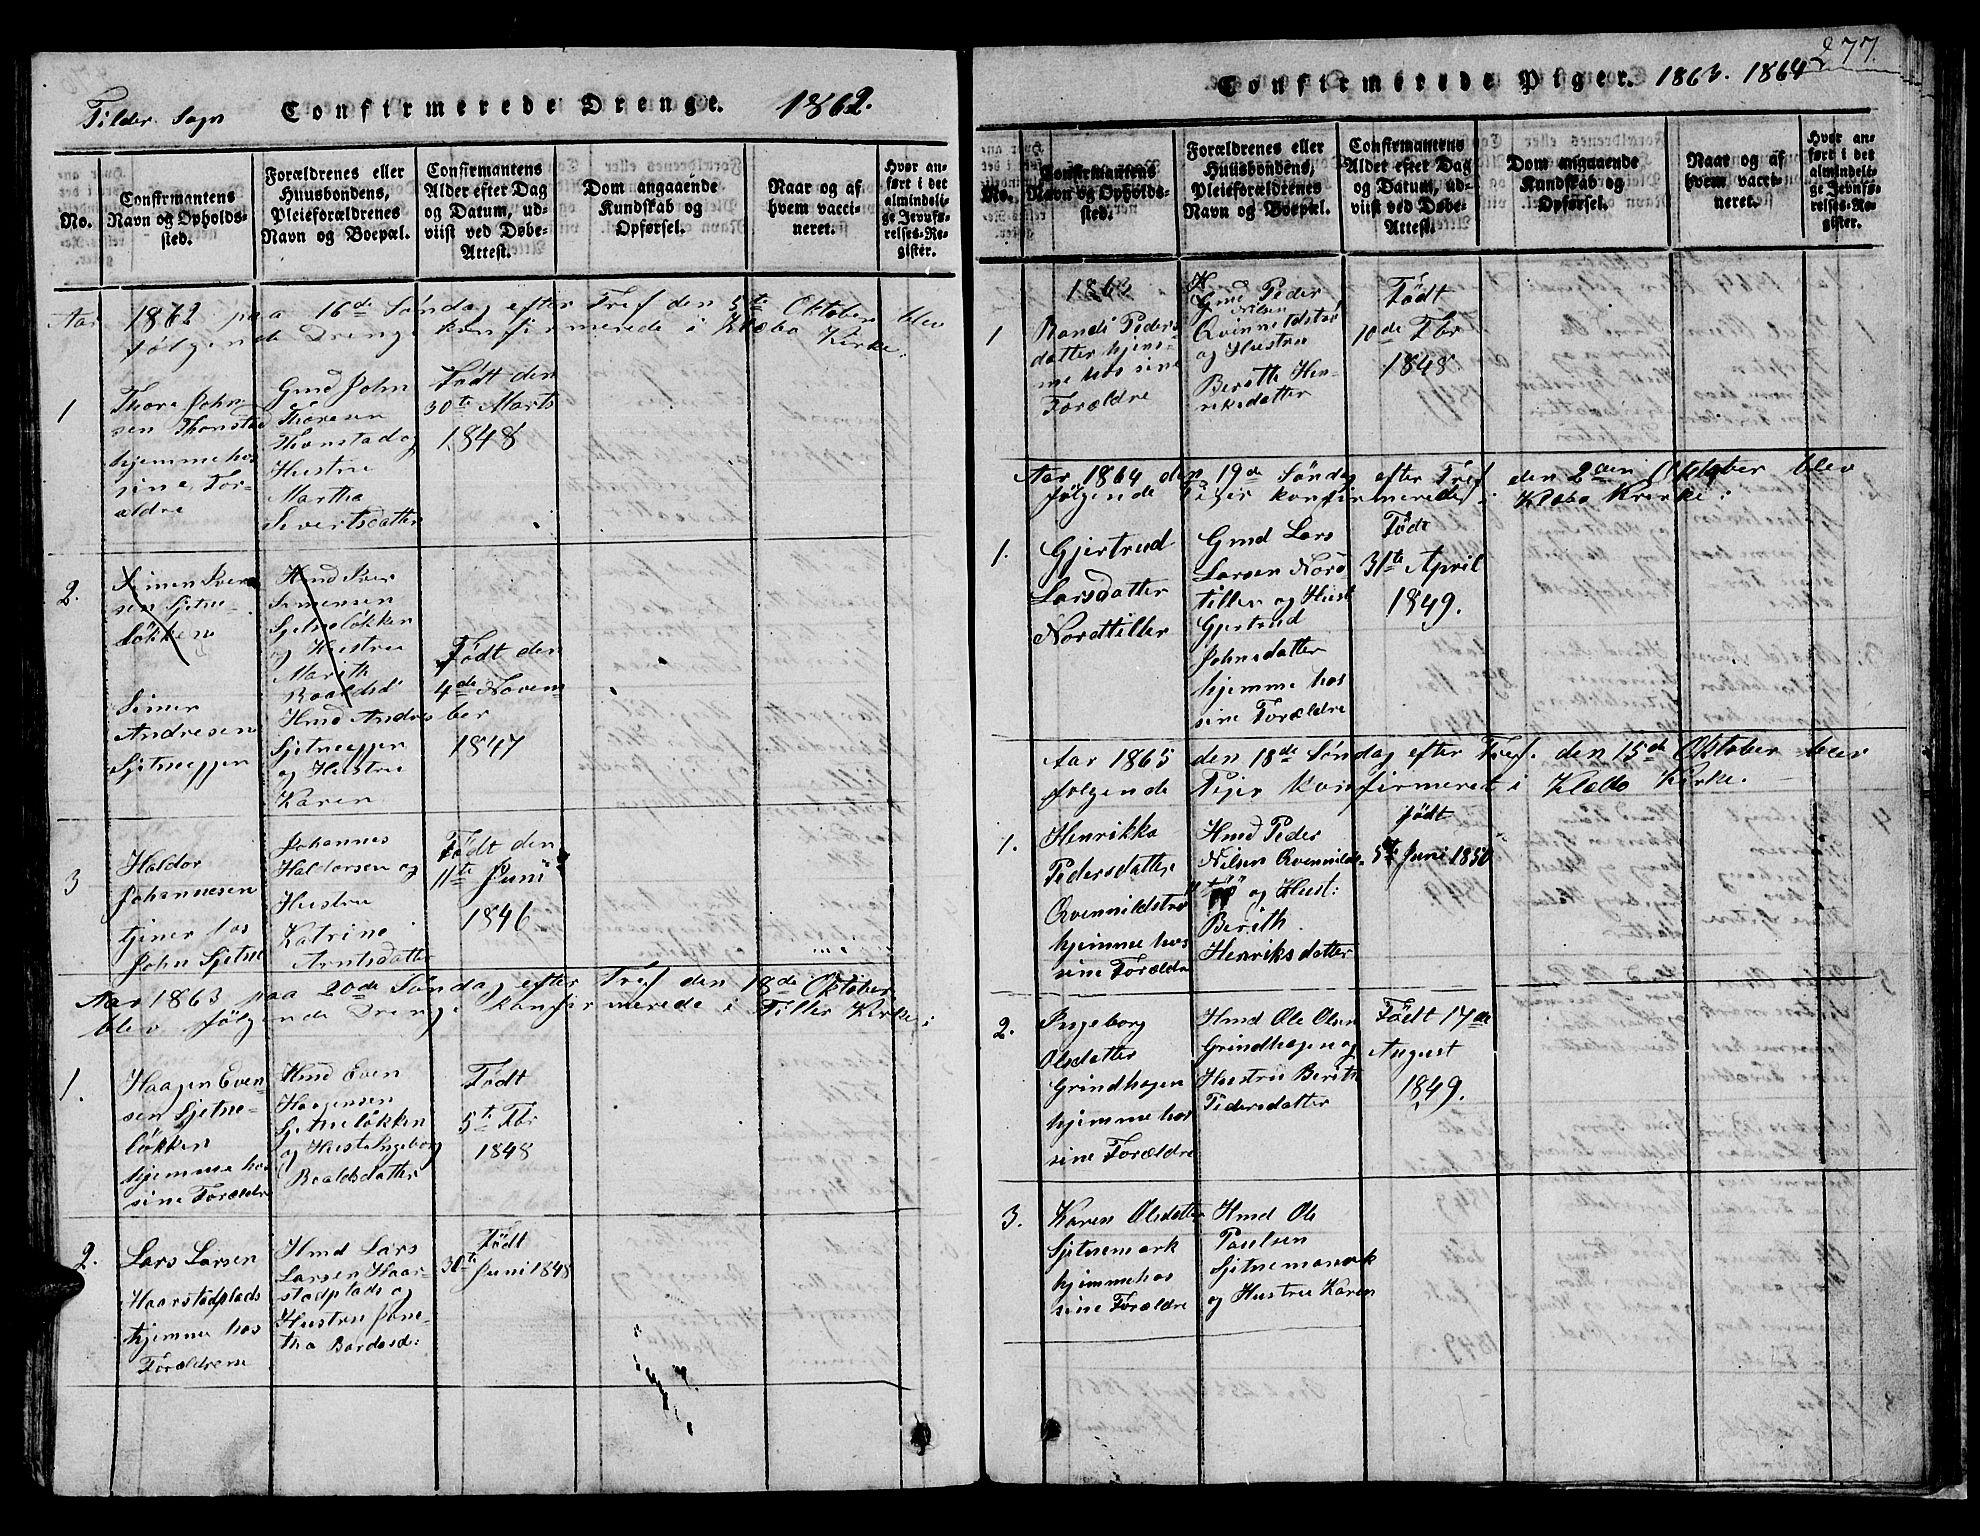 SAT, Ministerialprotokoller, klokkerbøker og fødselsregistre - Sør-Trøndelag, 621/L0458: Parish register (copy) no. 621C01, 1816-1865, p. 277